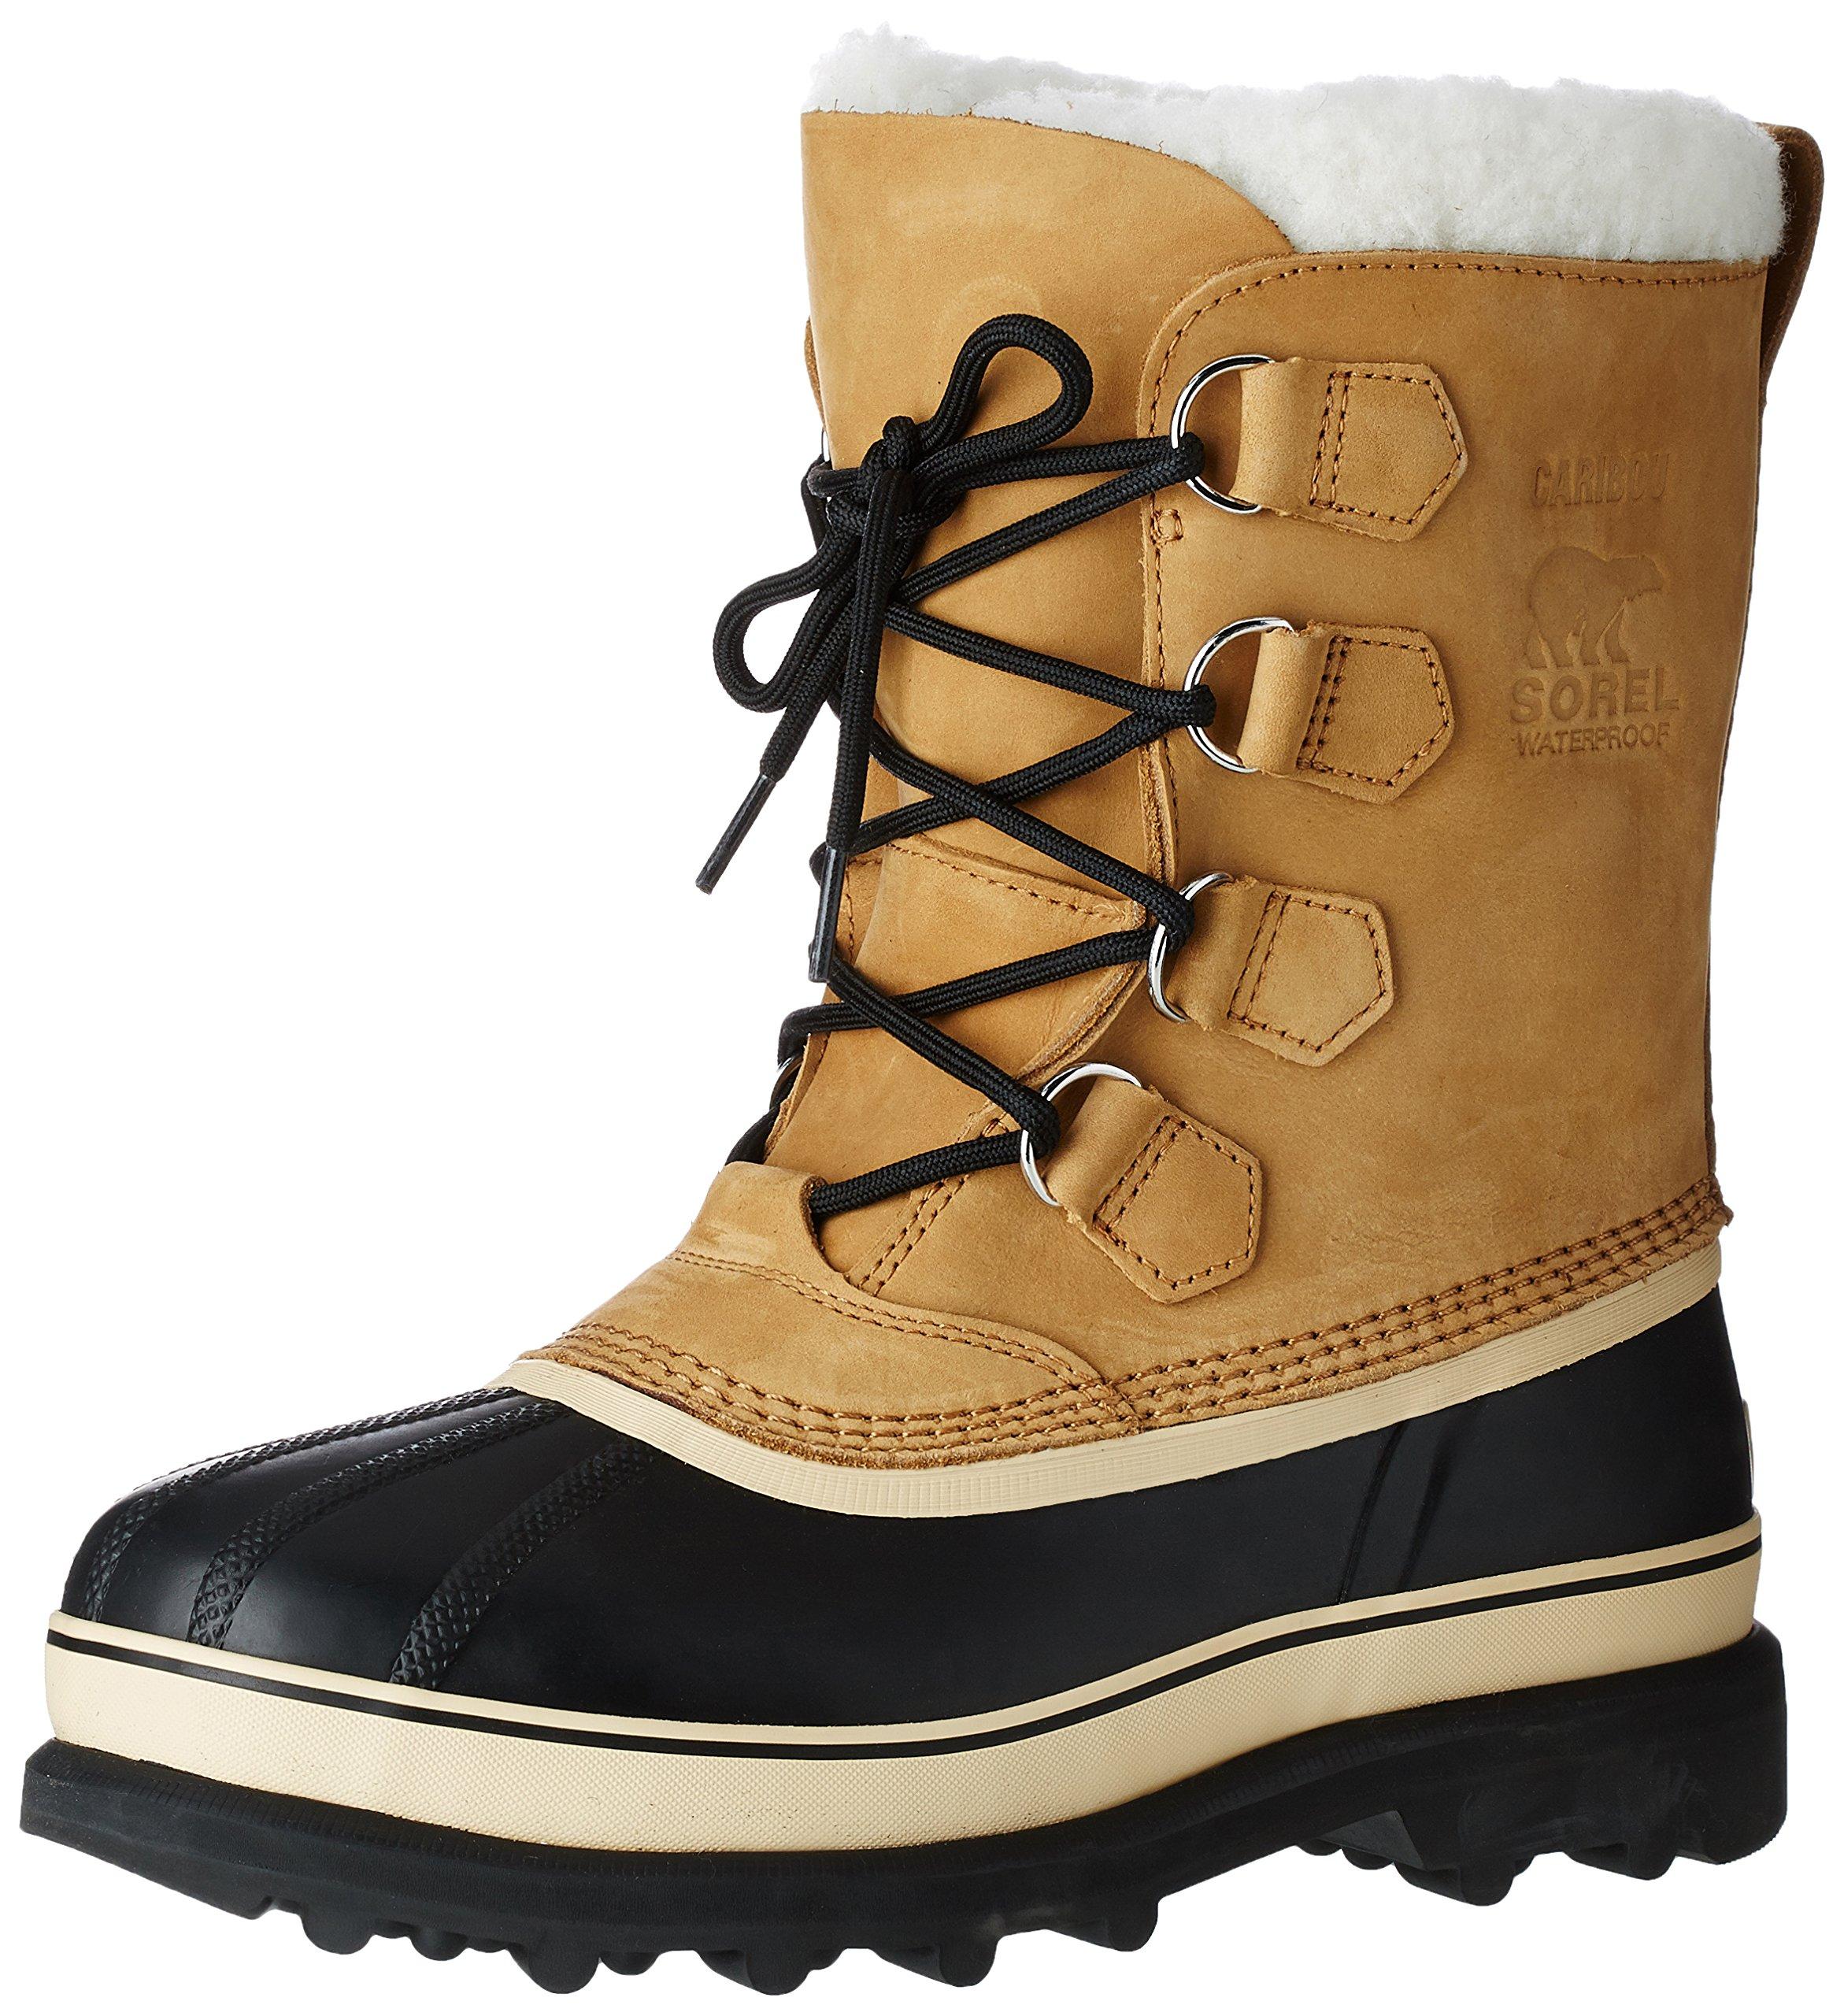 Sorel Men's Caribou Boots, Buff, 10.5 D(M) US